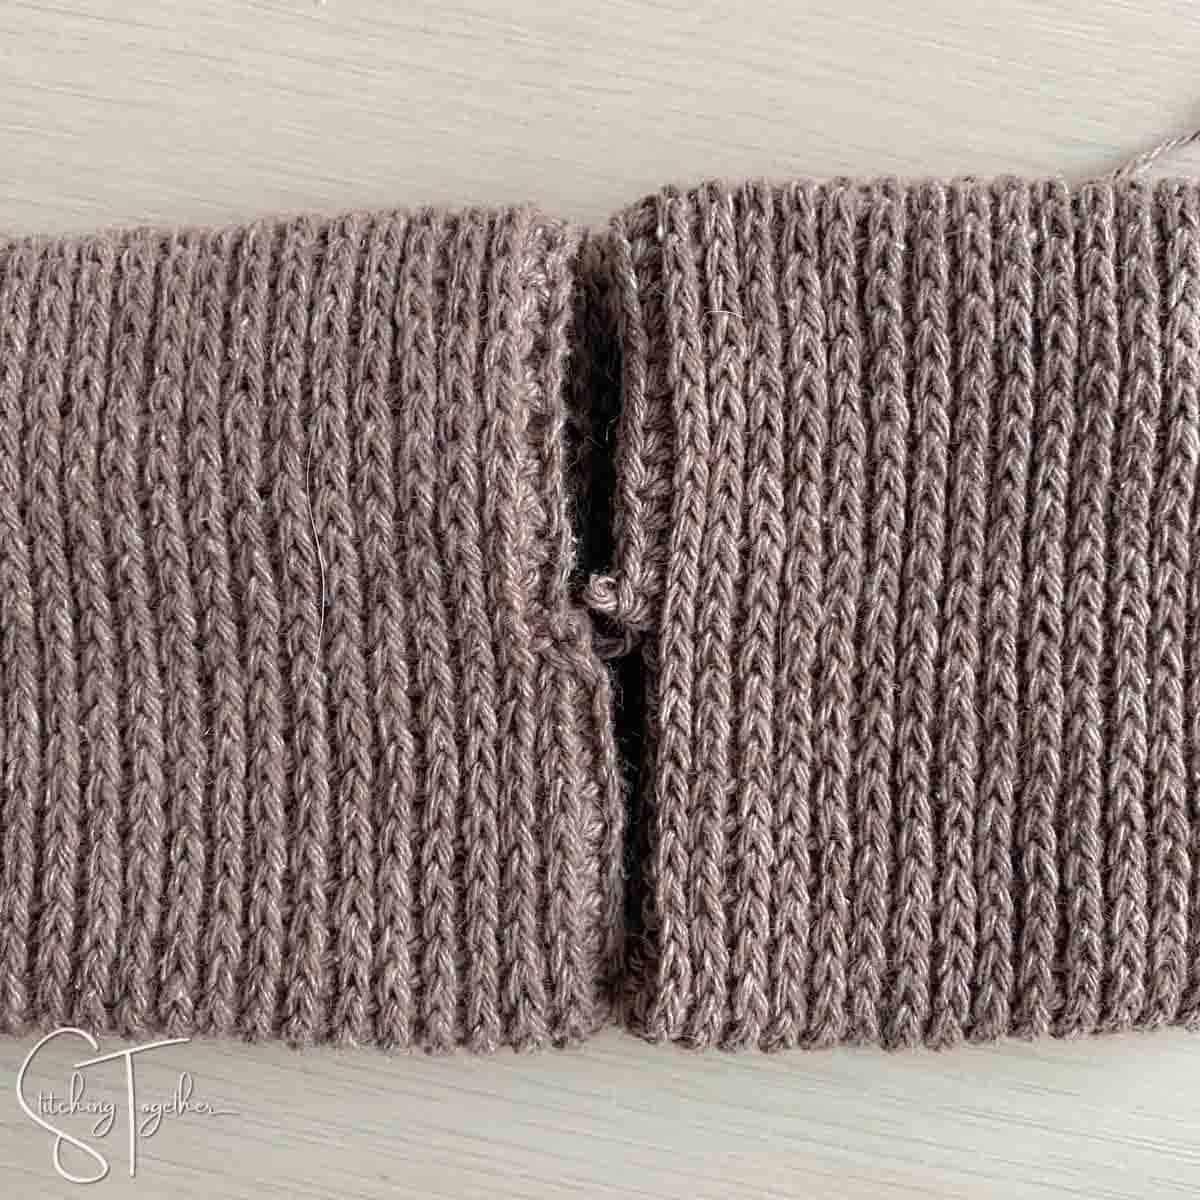 lining up ends of a crochet headband